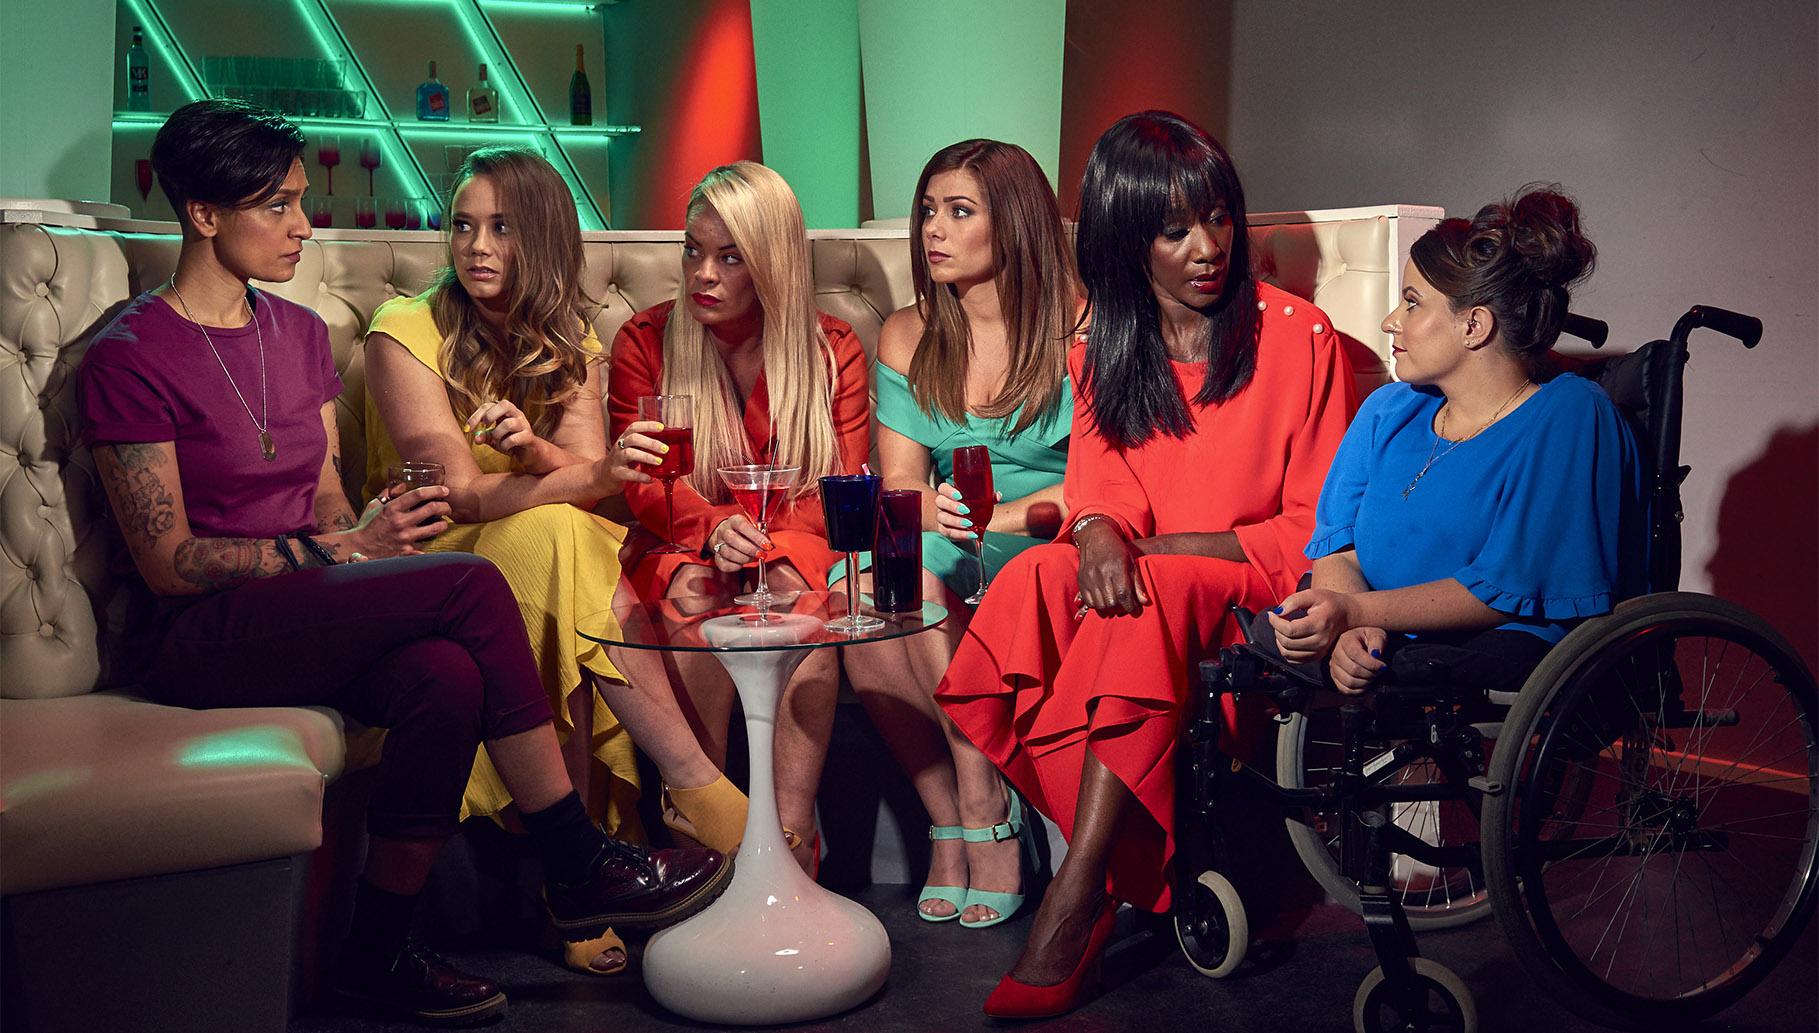 Hollyoaks spoilers: Who will kill Glenn Donovan? The WAGs reveal all